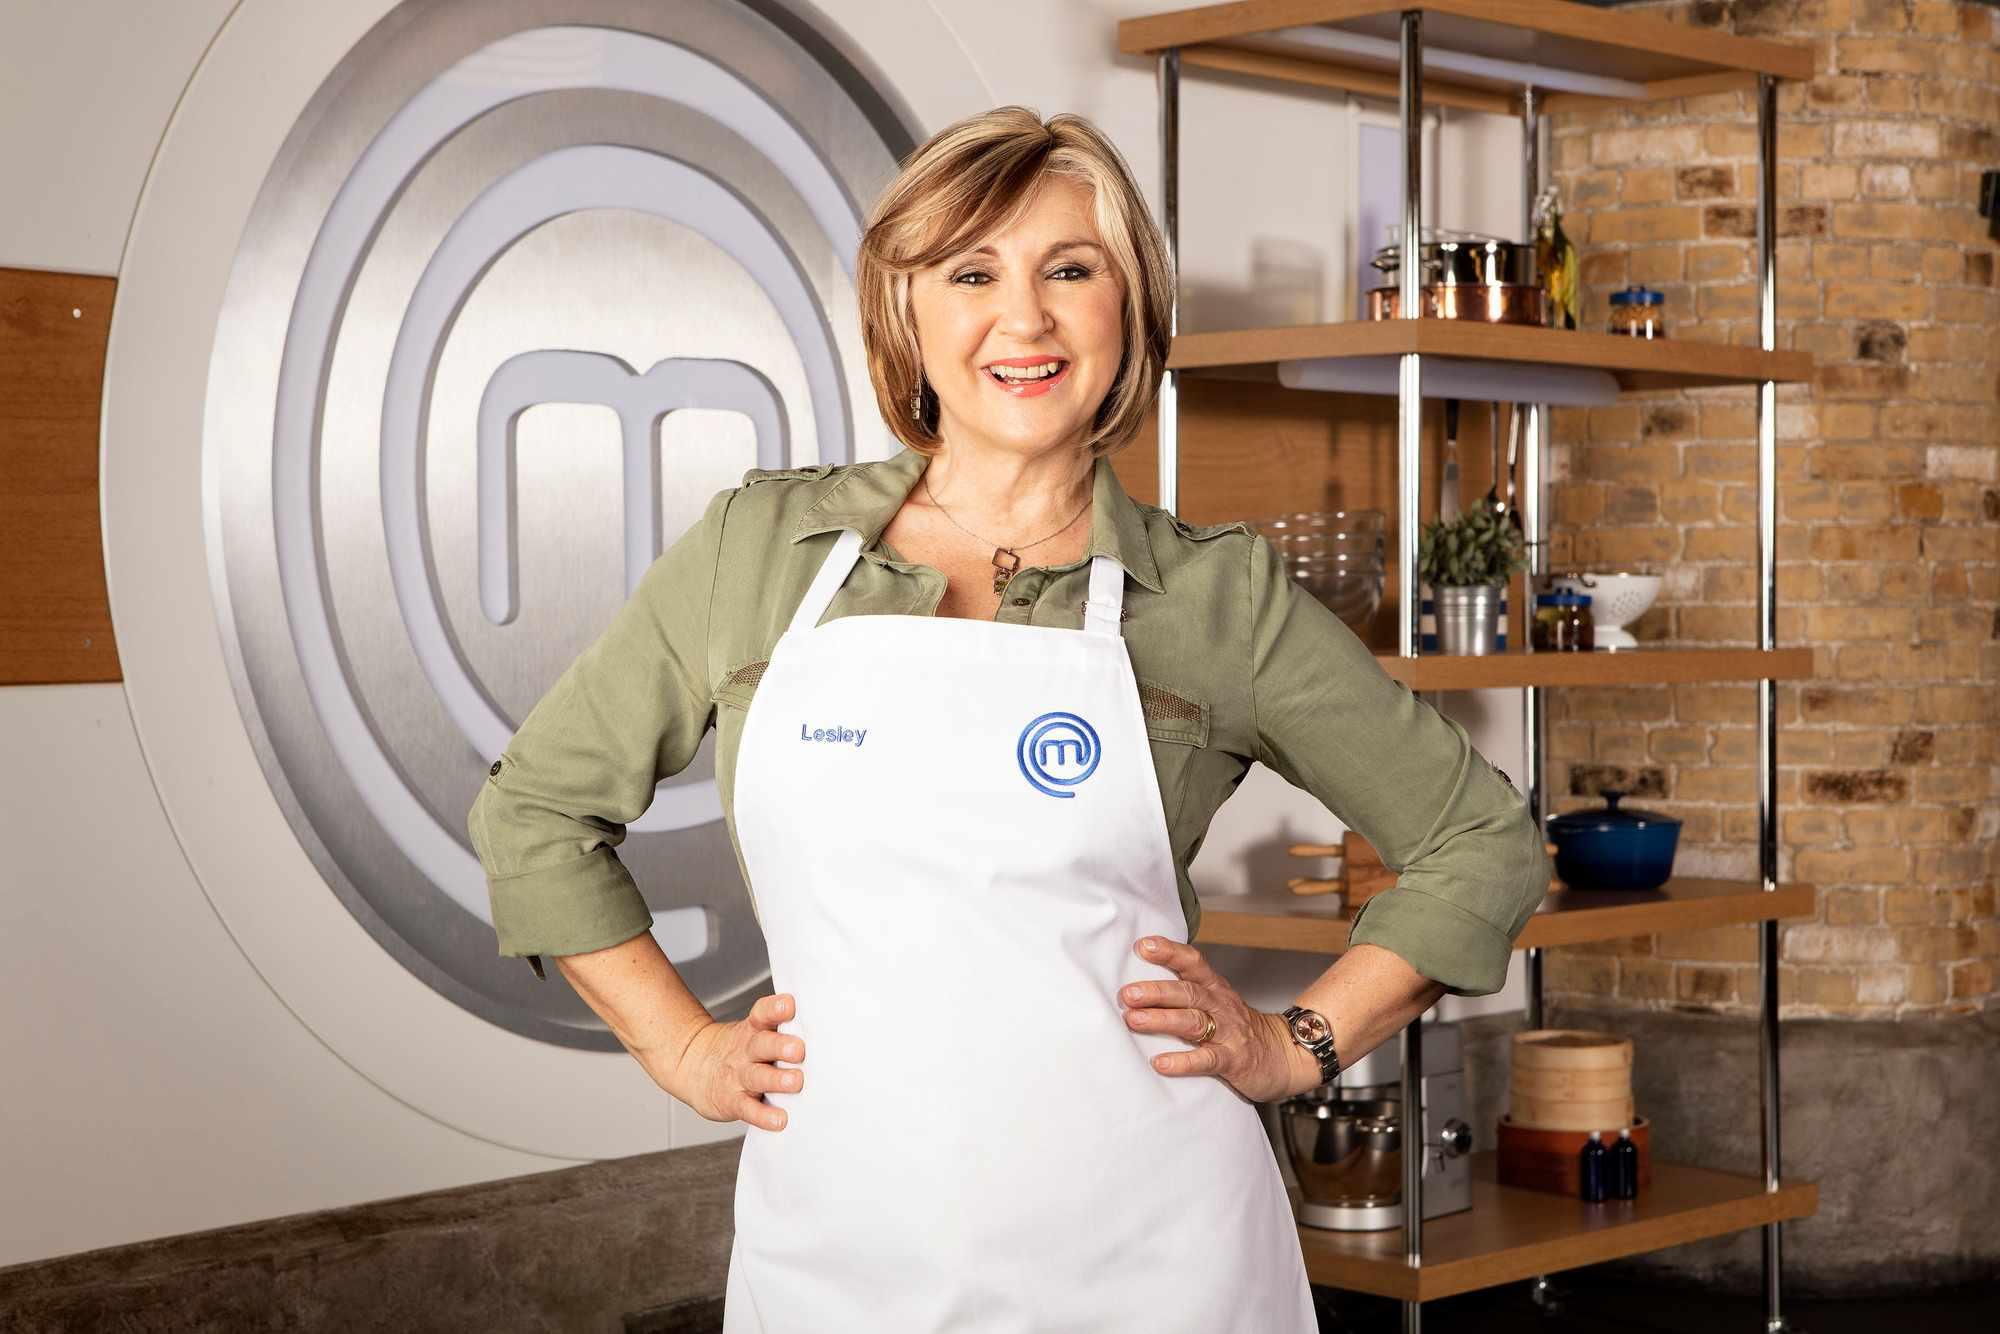 Celebrity MasterChef contestant Lesley Garrett